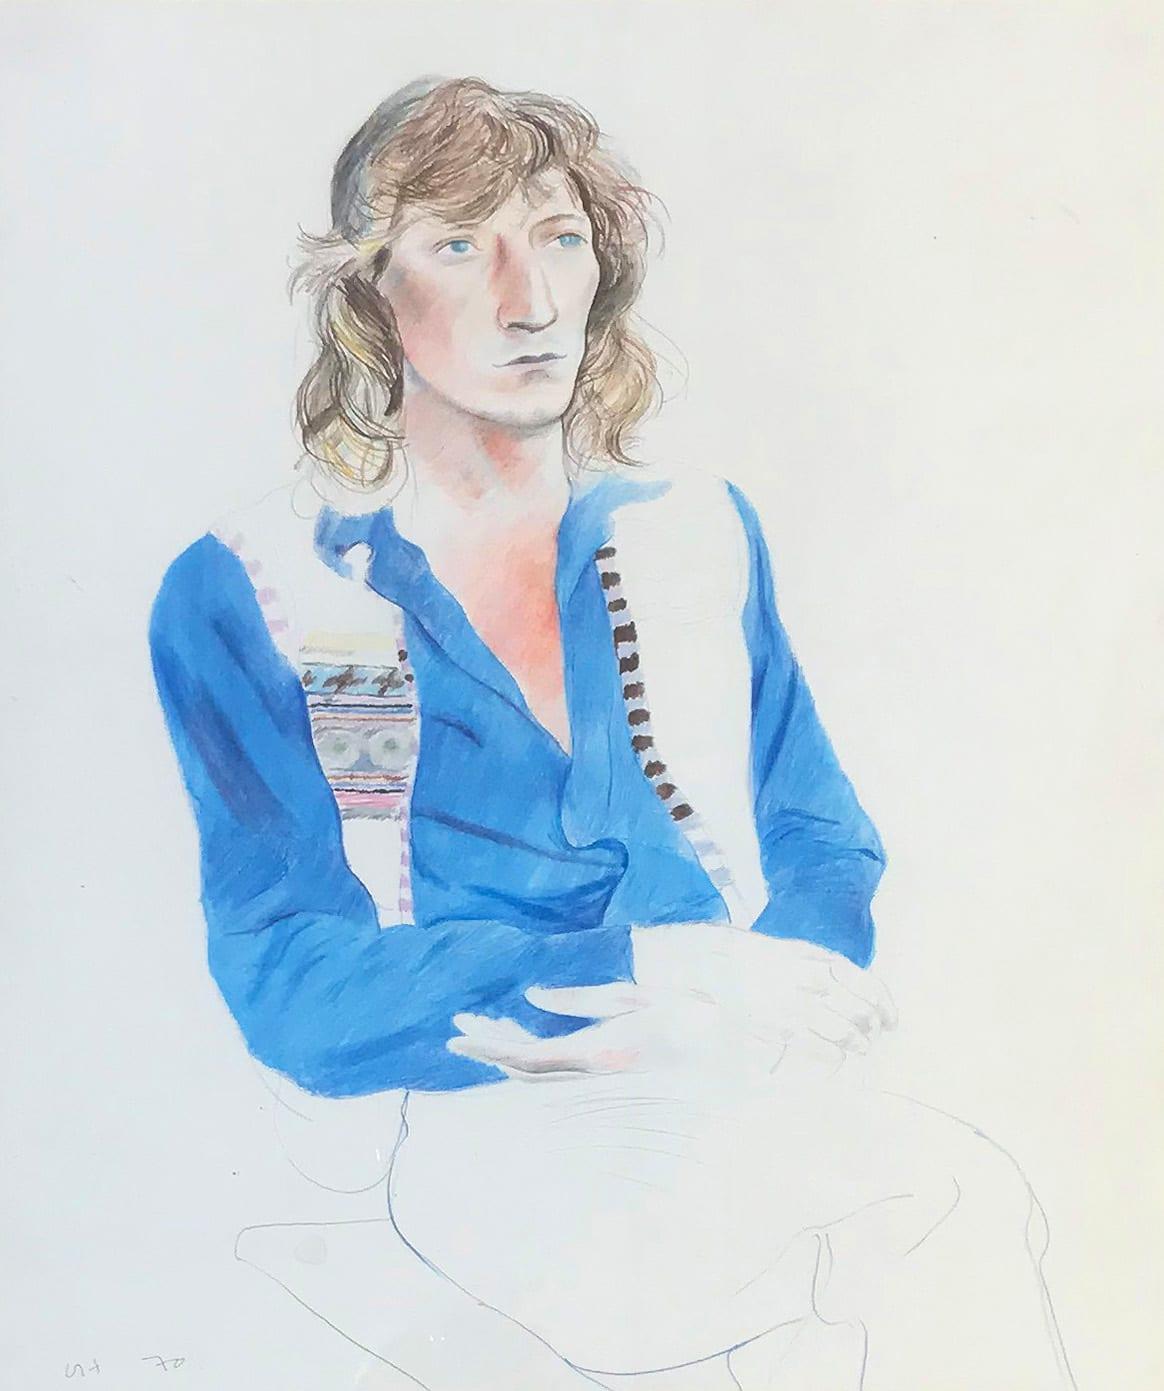 "<span class=""link fancybox-details-link""><a href=""/artists/43-david-hockney/works/1016-david-hockney-tchaik-chassay-1970/"">View Detail Page</a></span><div class=""artist""><strong>David Hockney</strong></div> b.1937 <div class=""title""><em>Tchaik Chassay</em>, 1970</div> <div class=""signed_and_dated"">initialed and dated</div> <div class=""medium"">coloured pencil on paper </div> <div class=""dimensions"">42.6 x 35.9cm</div>"